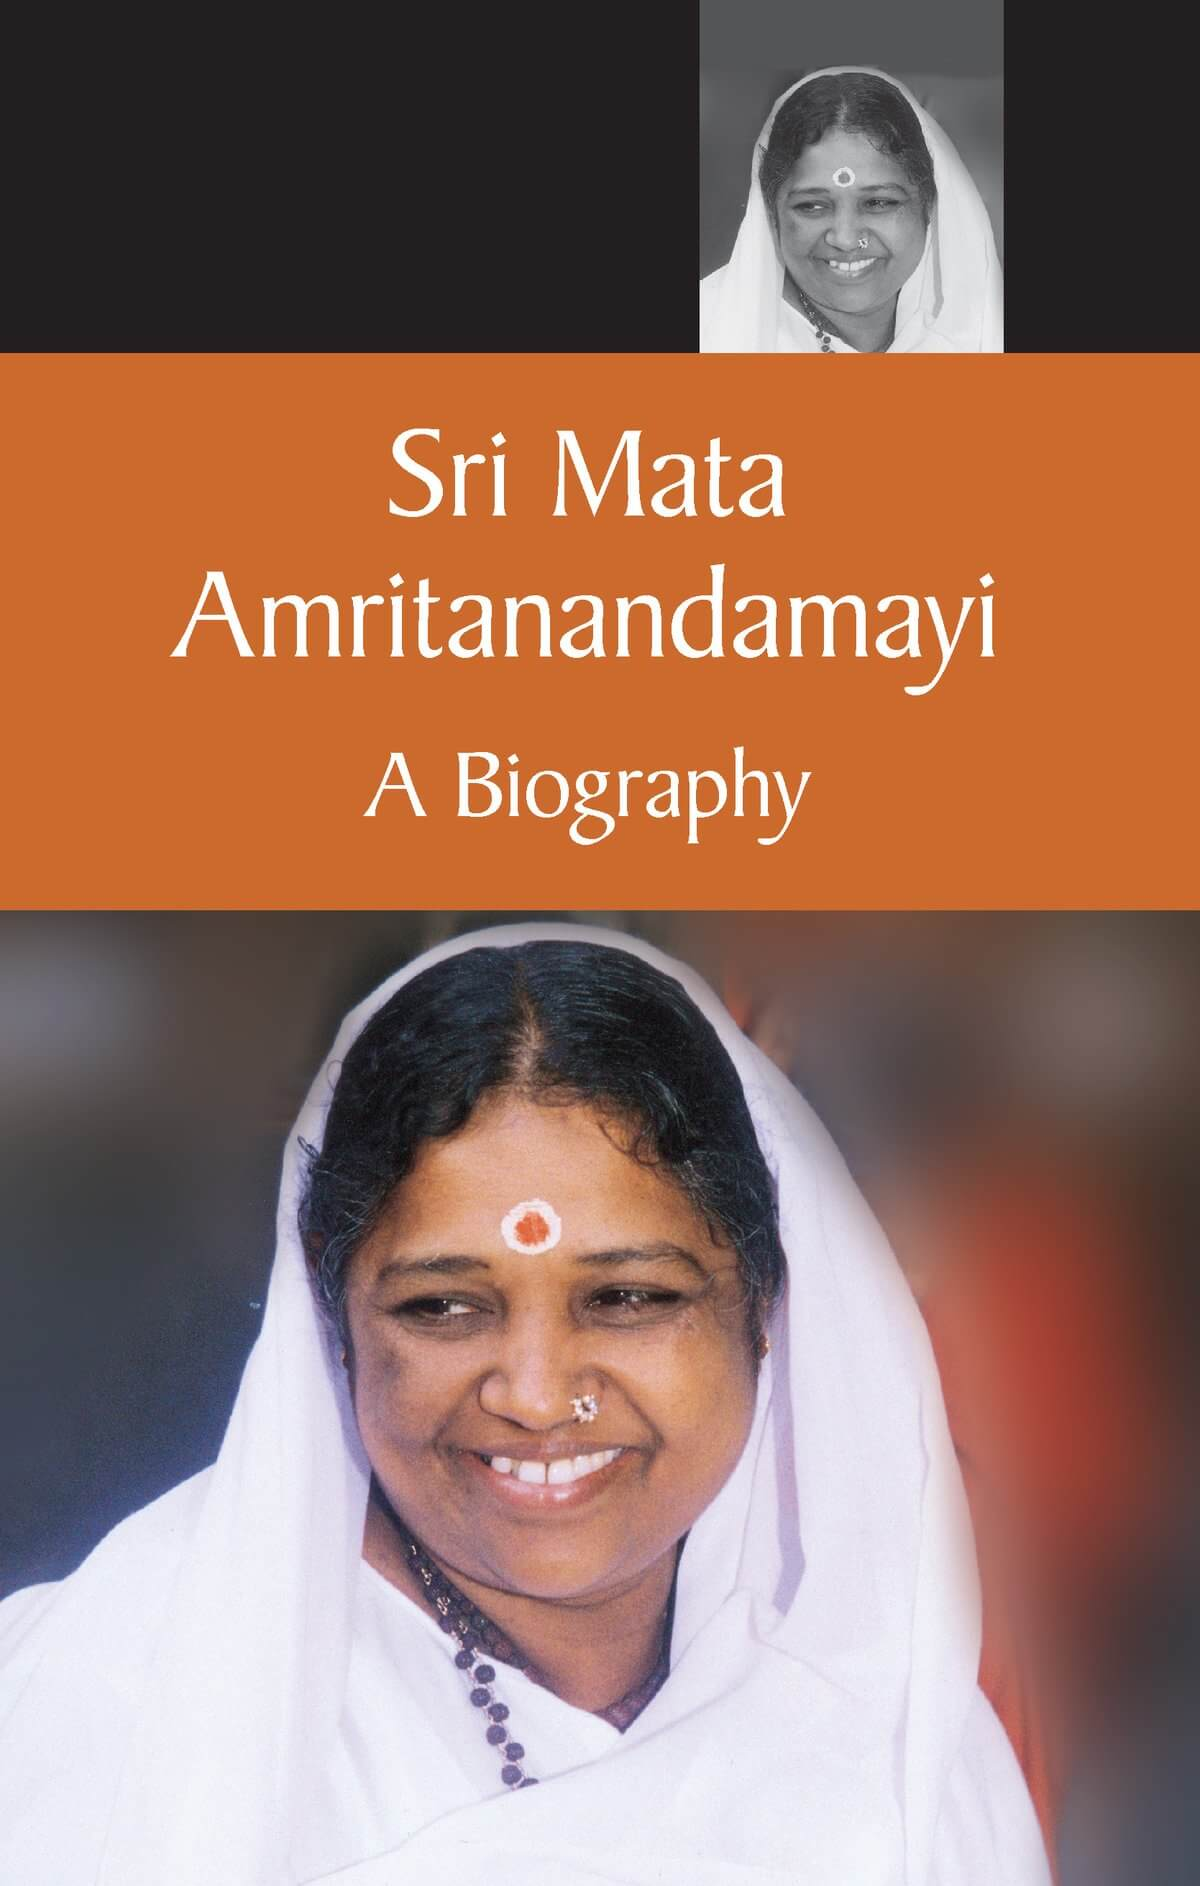 Sri Mata Amritanandamayi - Eine Biographie